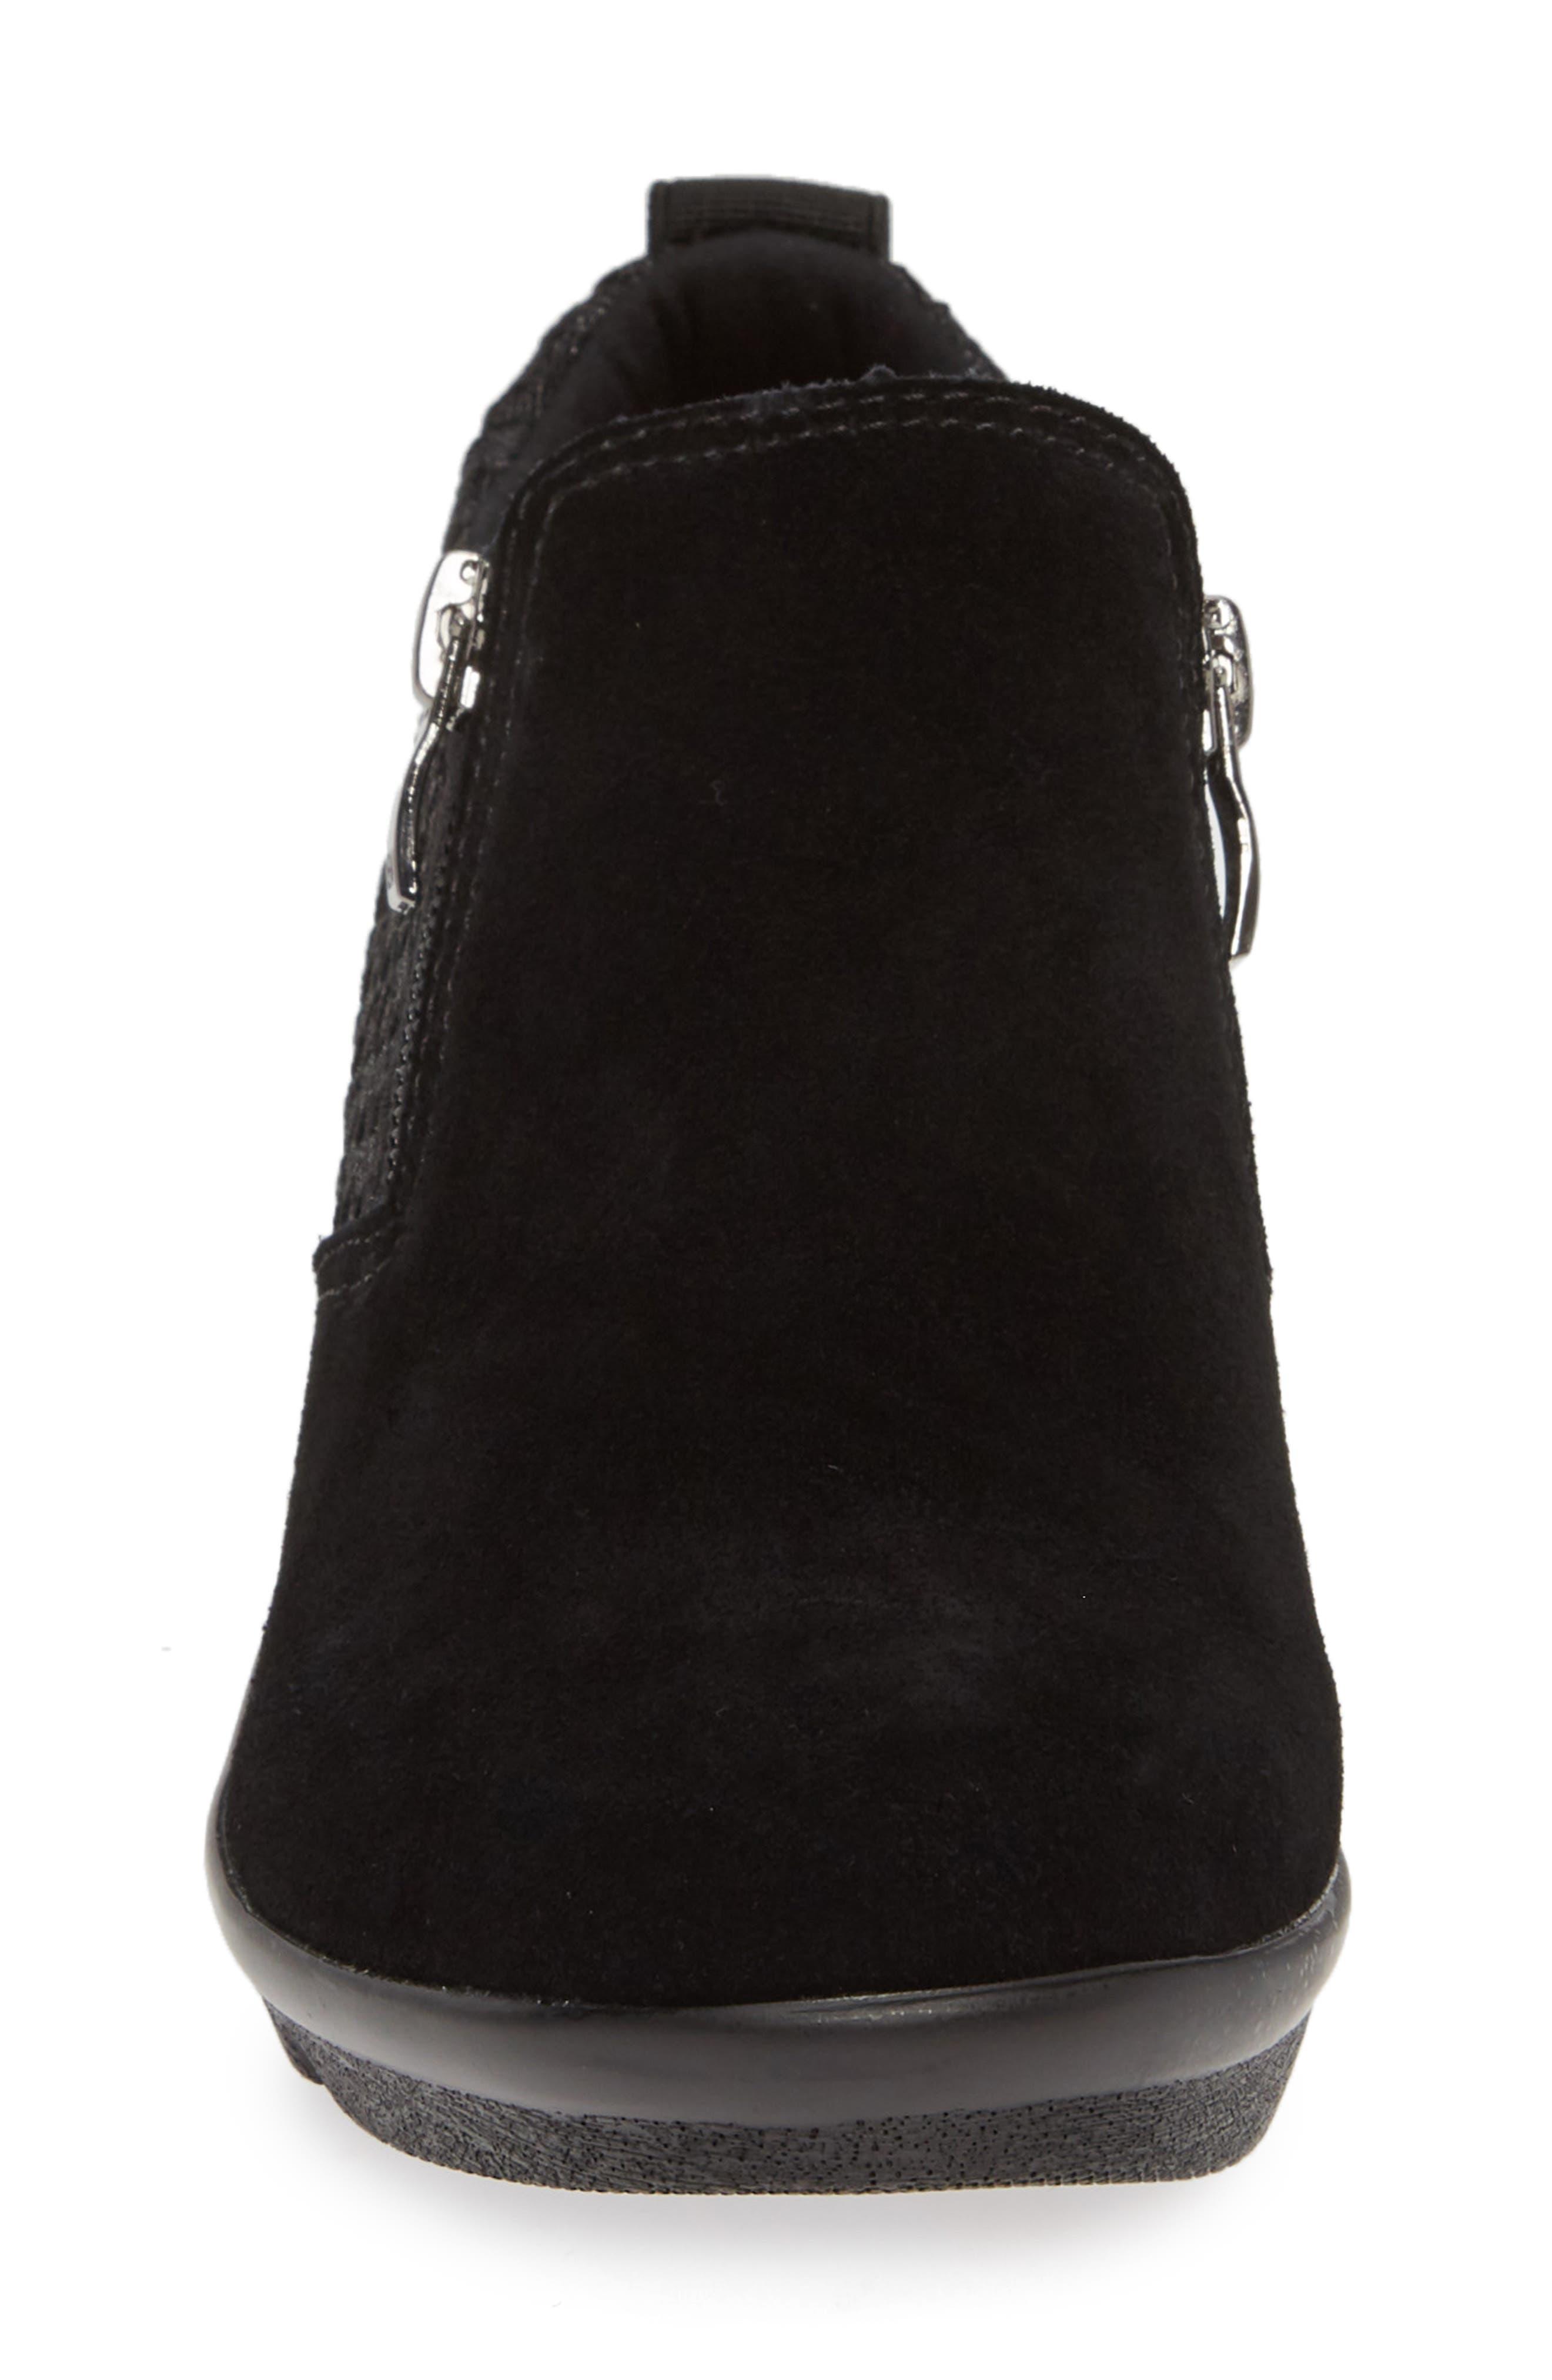 Lihi Ankle Boot,                             Alternate thumbnail 4, color,                             BLACK METALLIC LEATHER